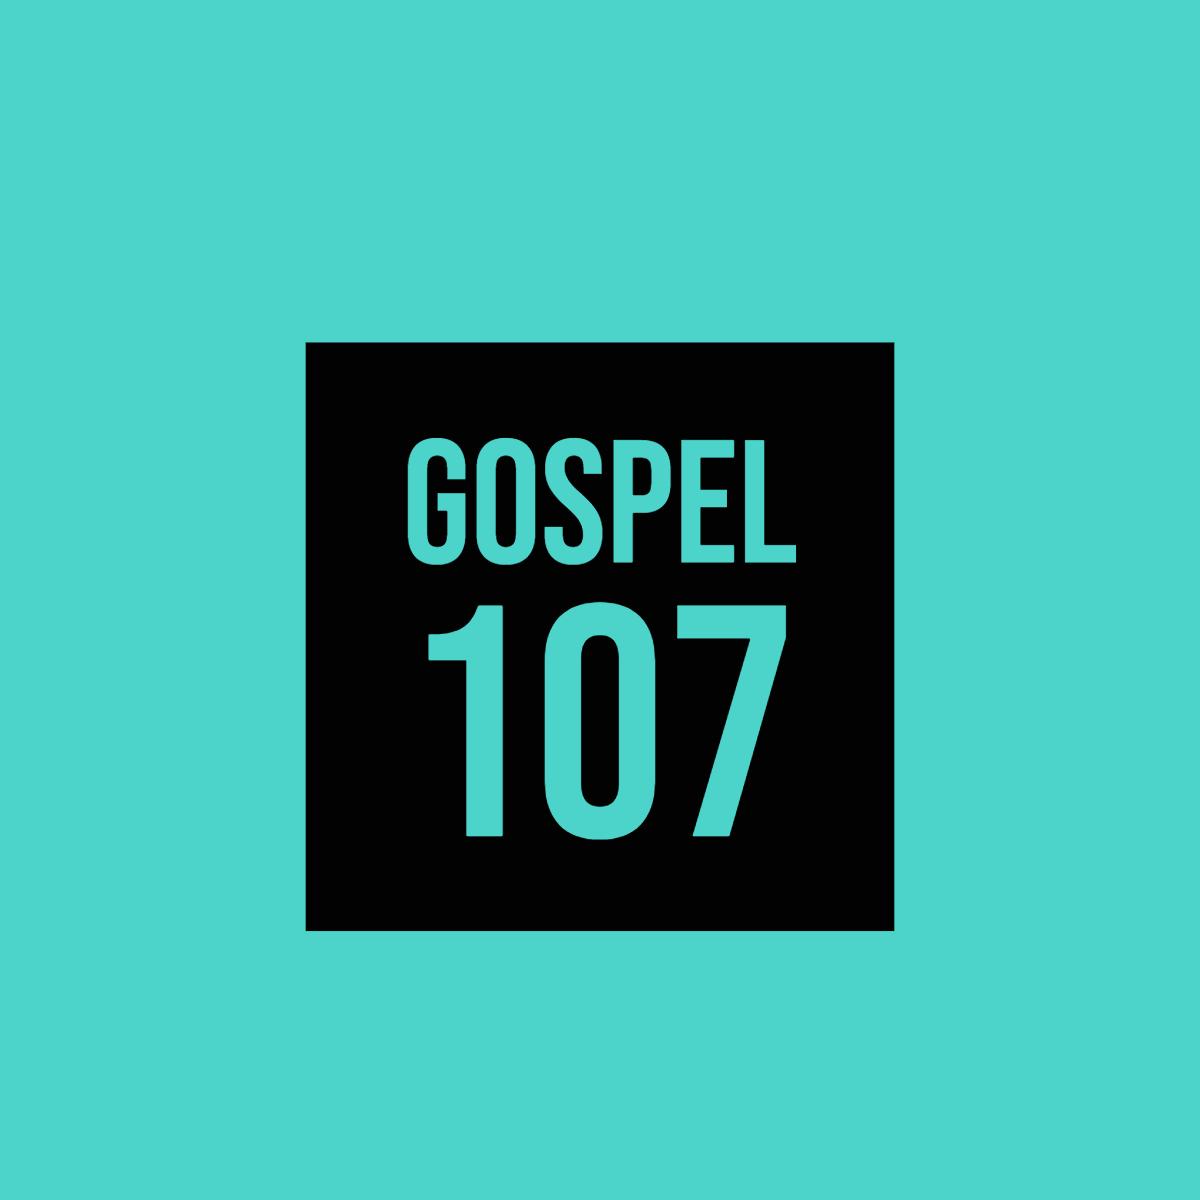 GOSPEL 107